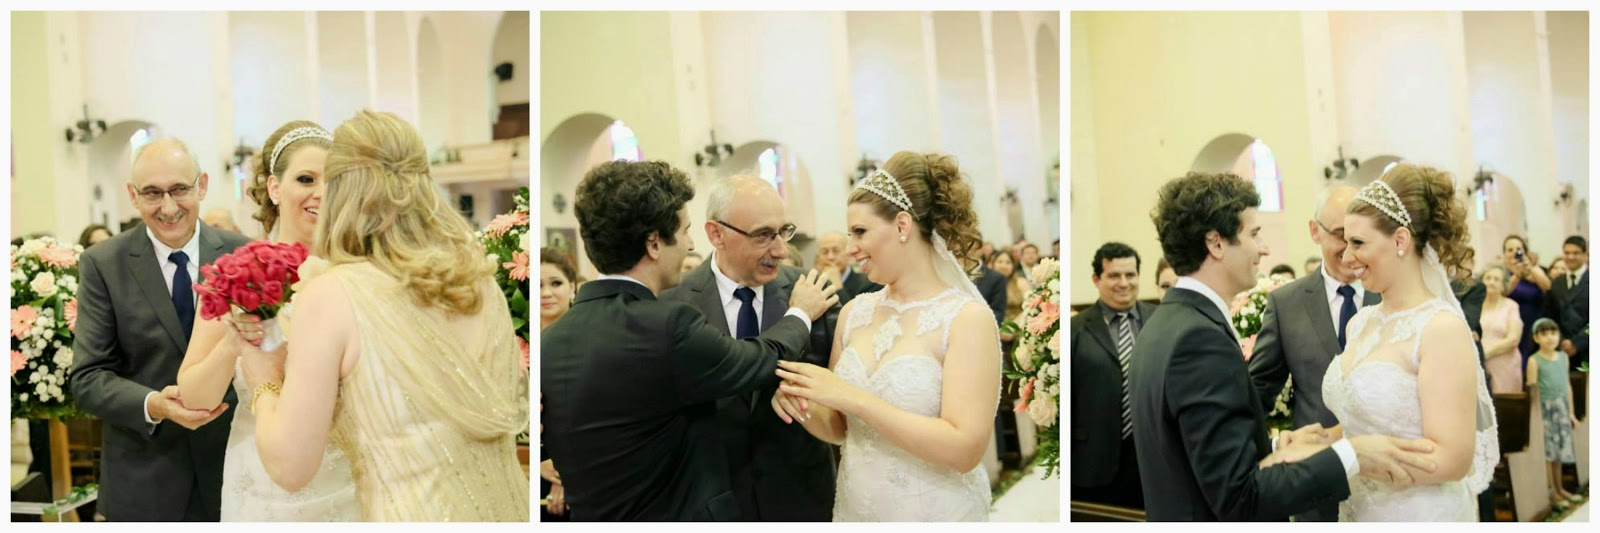 cerimonia-entrada-noiva-encontro-noivo